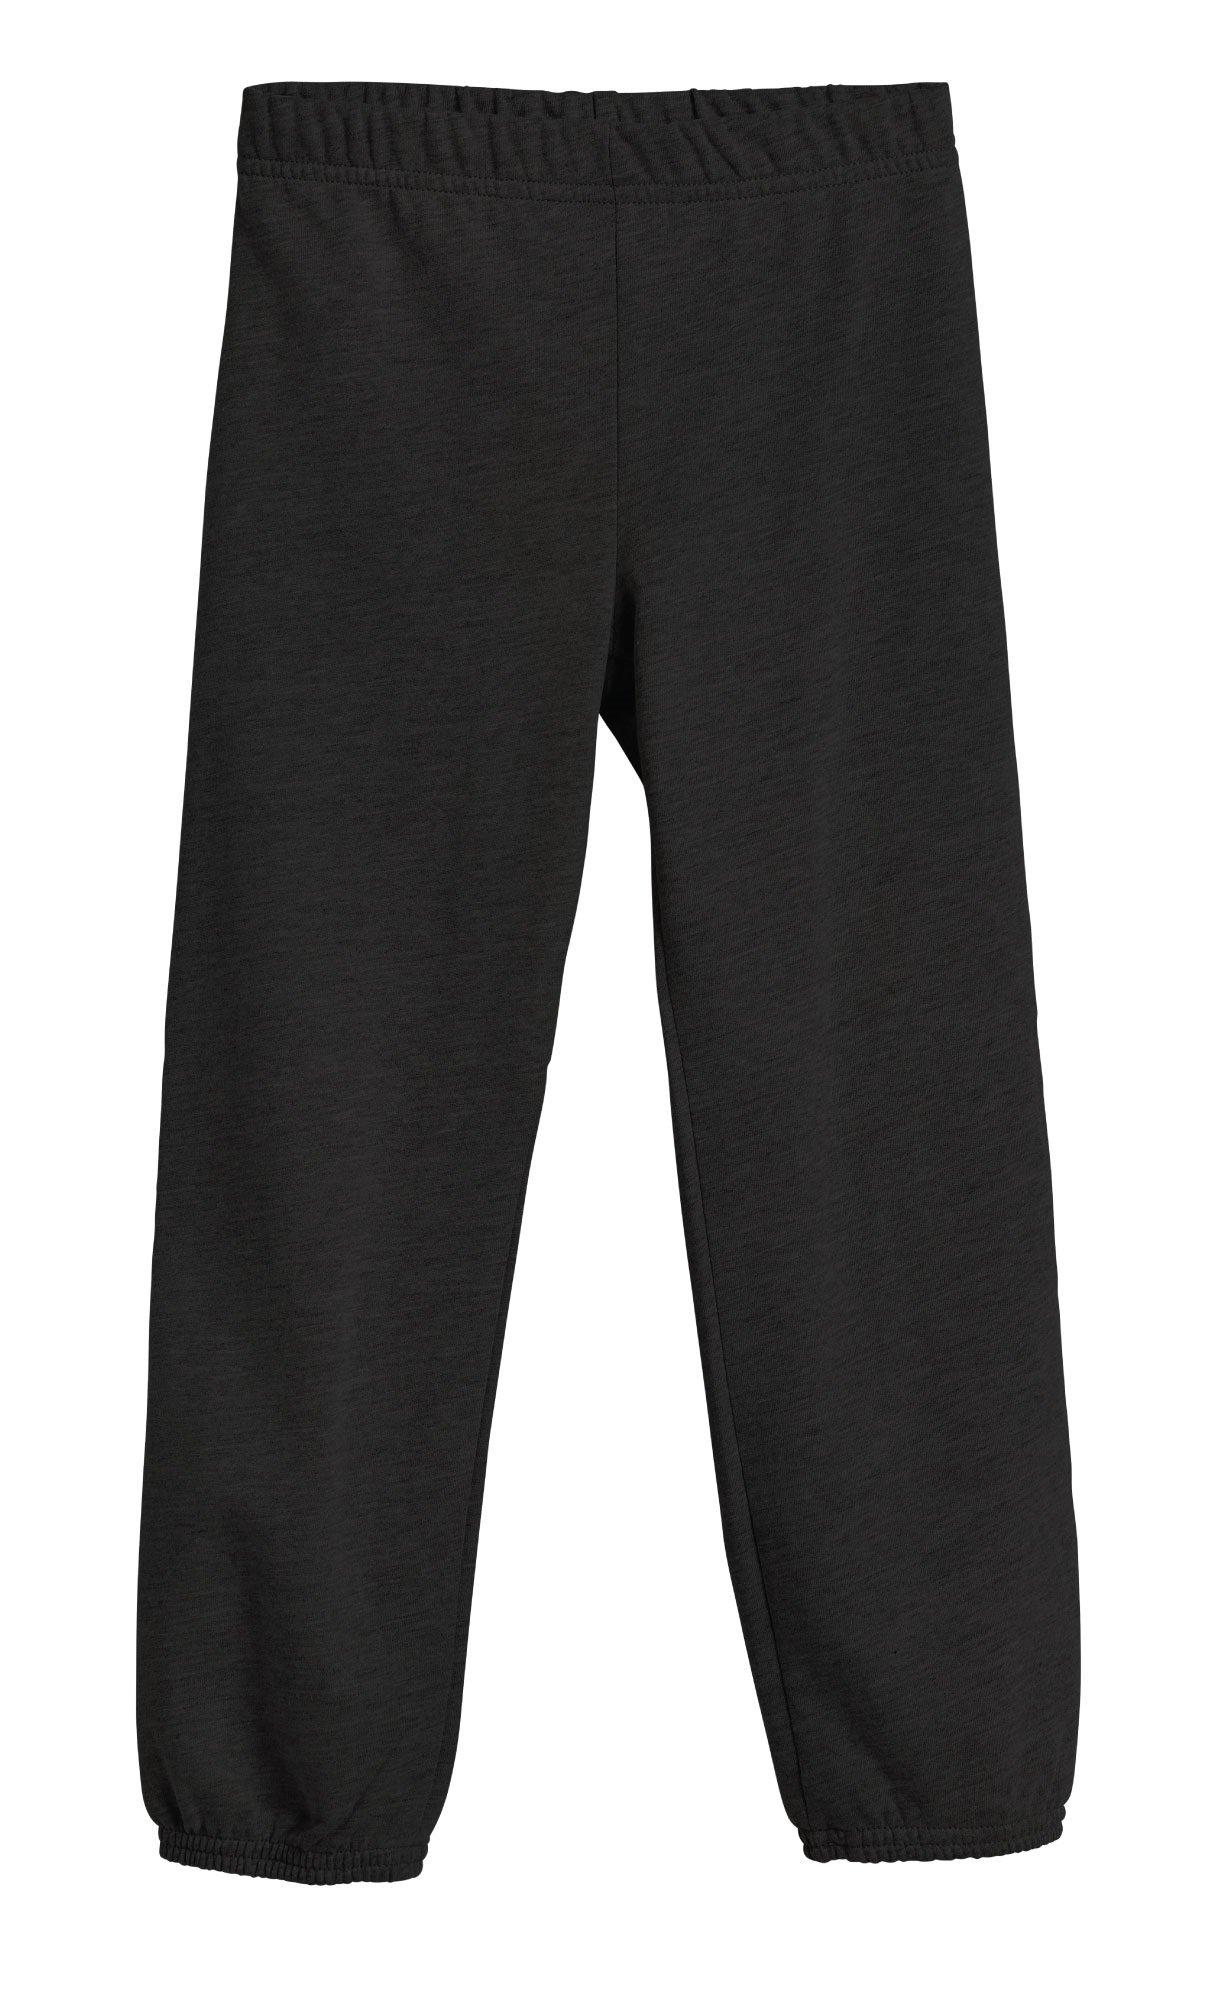 City Threads Big Boys and Girls' Soft Fleece sweatpant warmups Jogger Sports Sweats SPD Sensitive Friendly Clothing for Kis, Black, 12